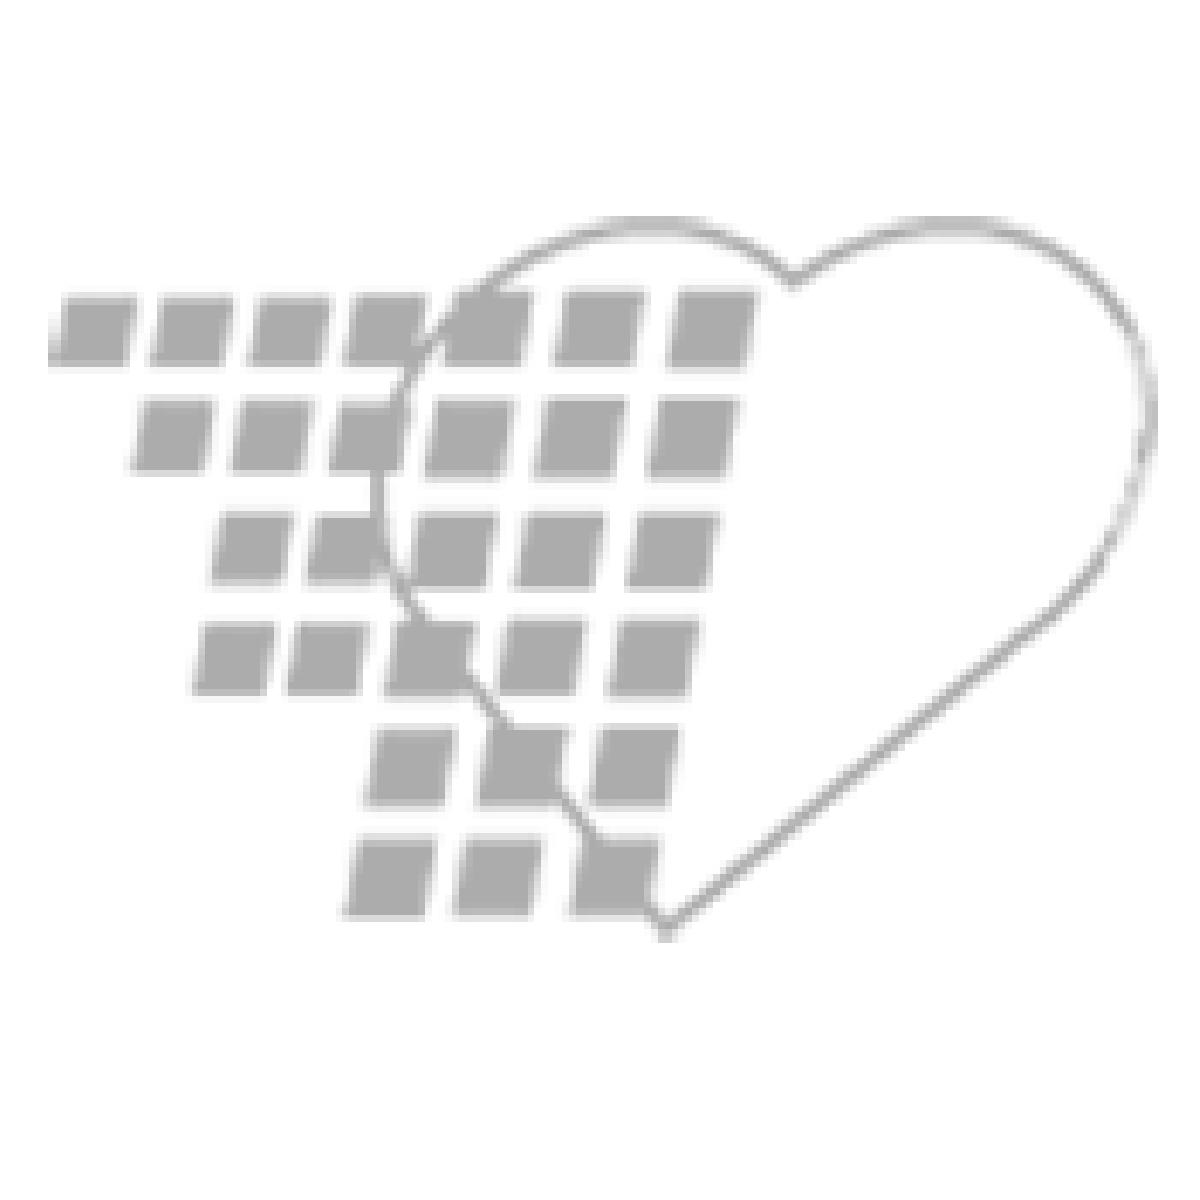 06-93-6203 Demo Dose® Simulated Platelets A Rh Negative